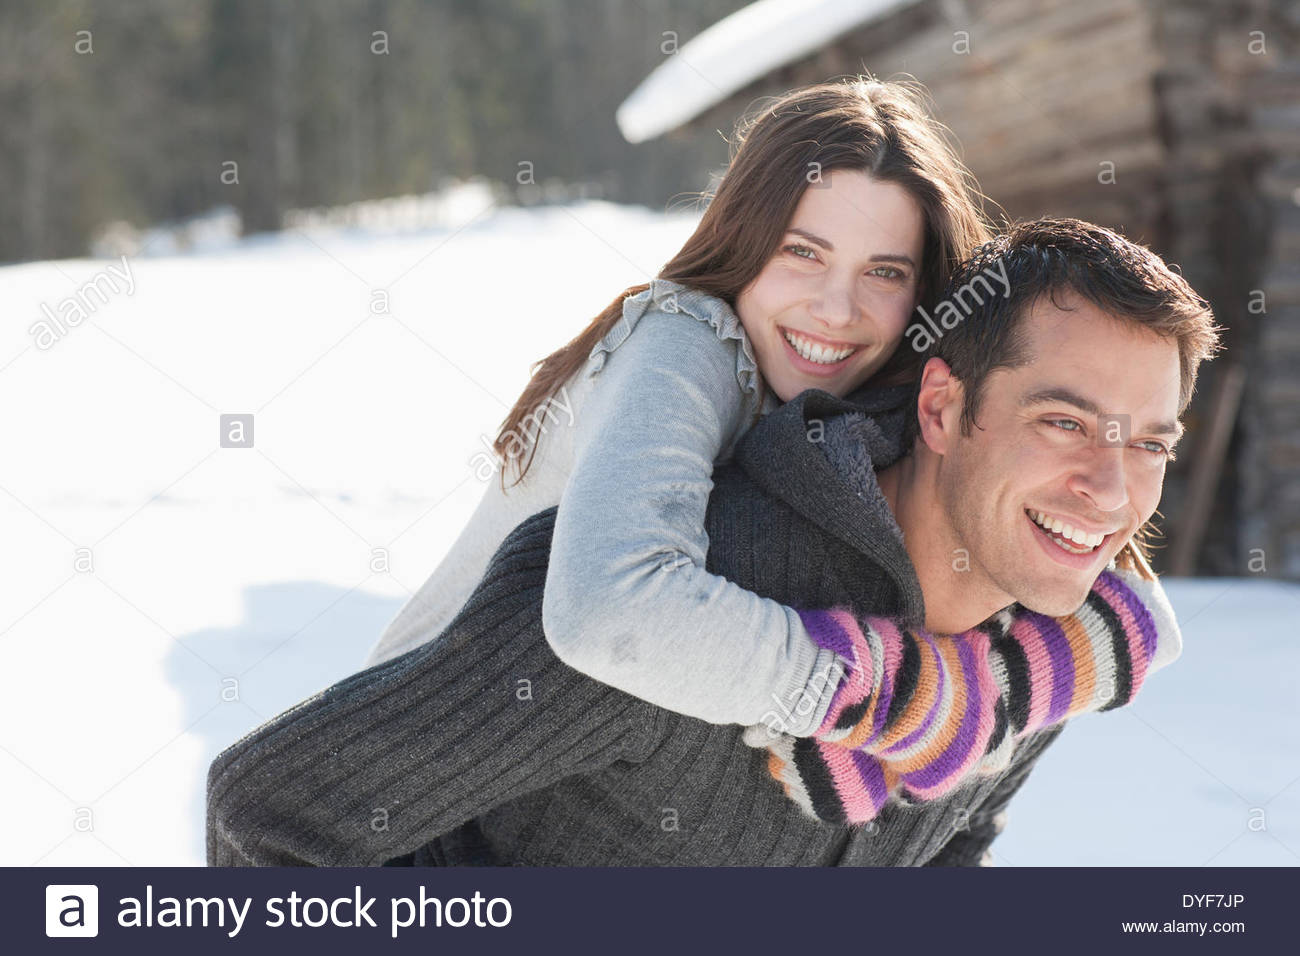 Man giving girlfriend piggyback ride Photo Stock